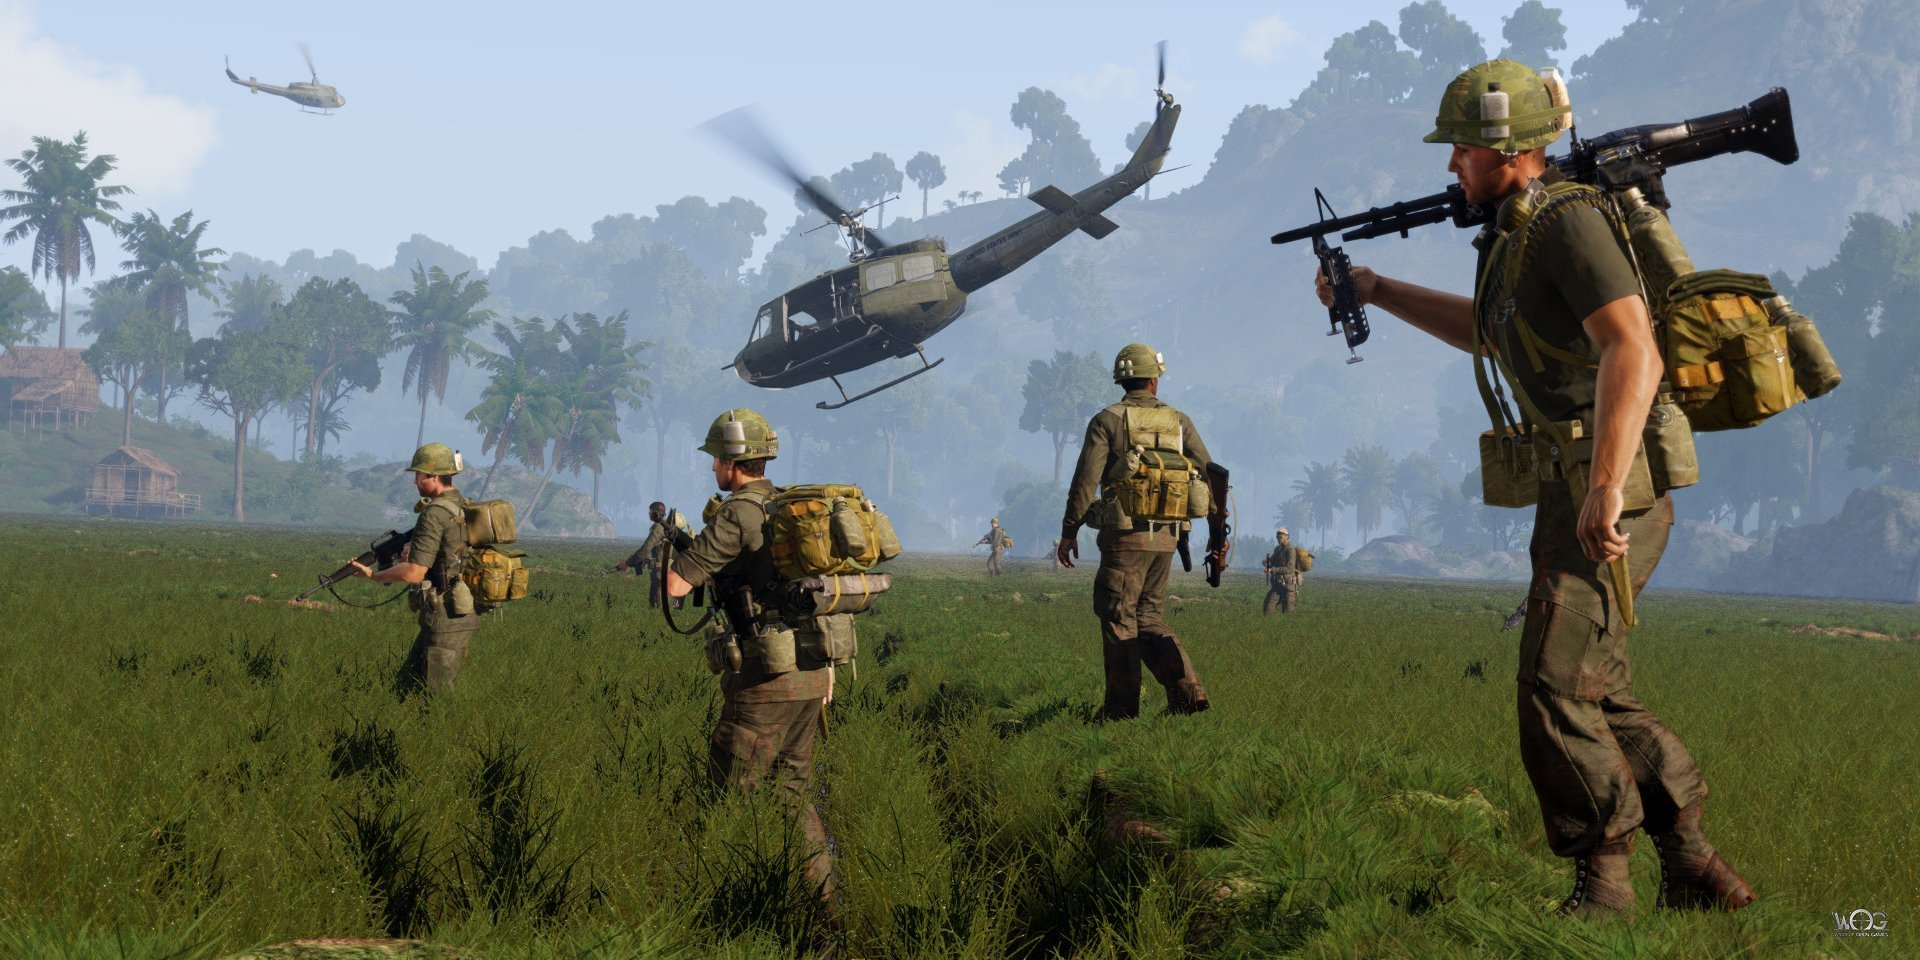 Battle of Mirasol Airfield